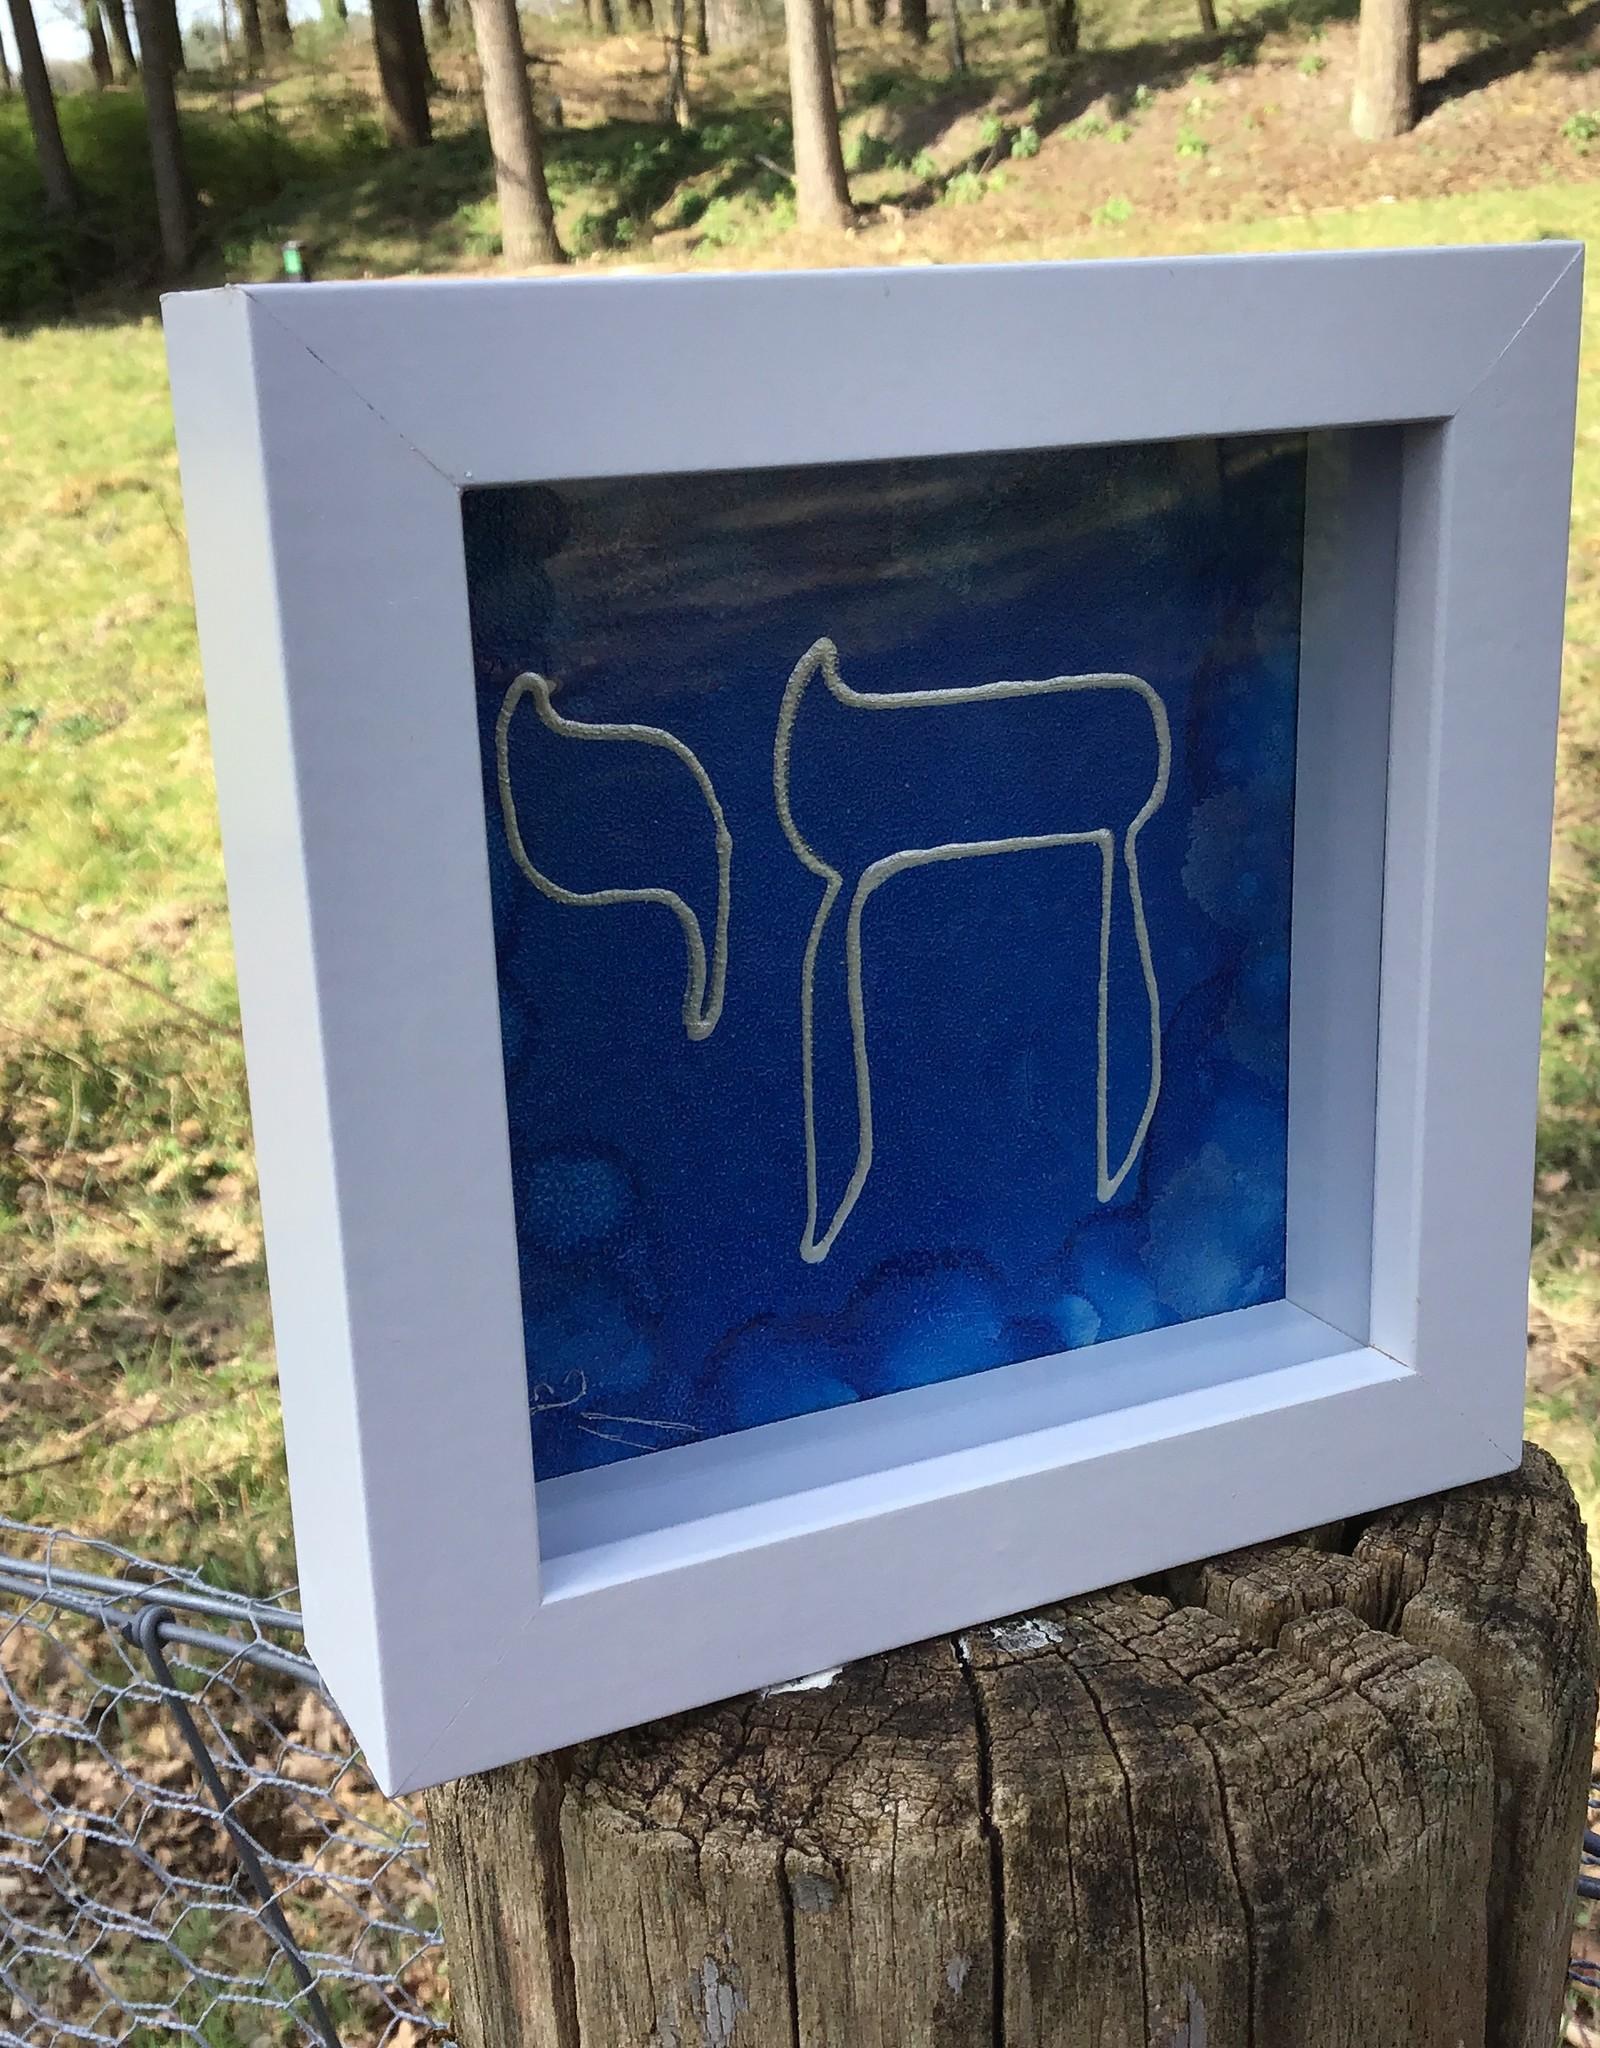 Chai on a cobalt blue background.